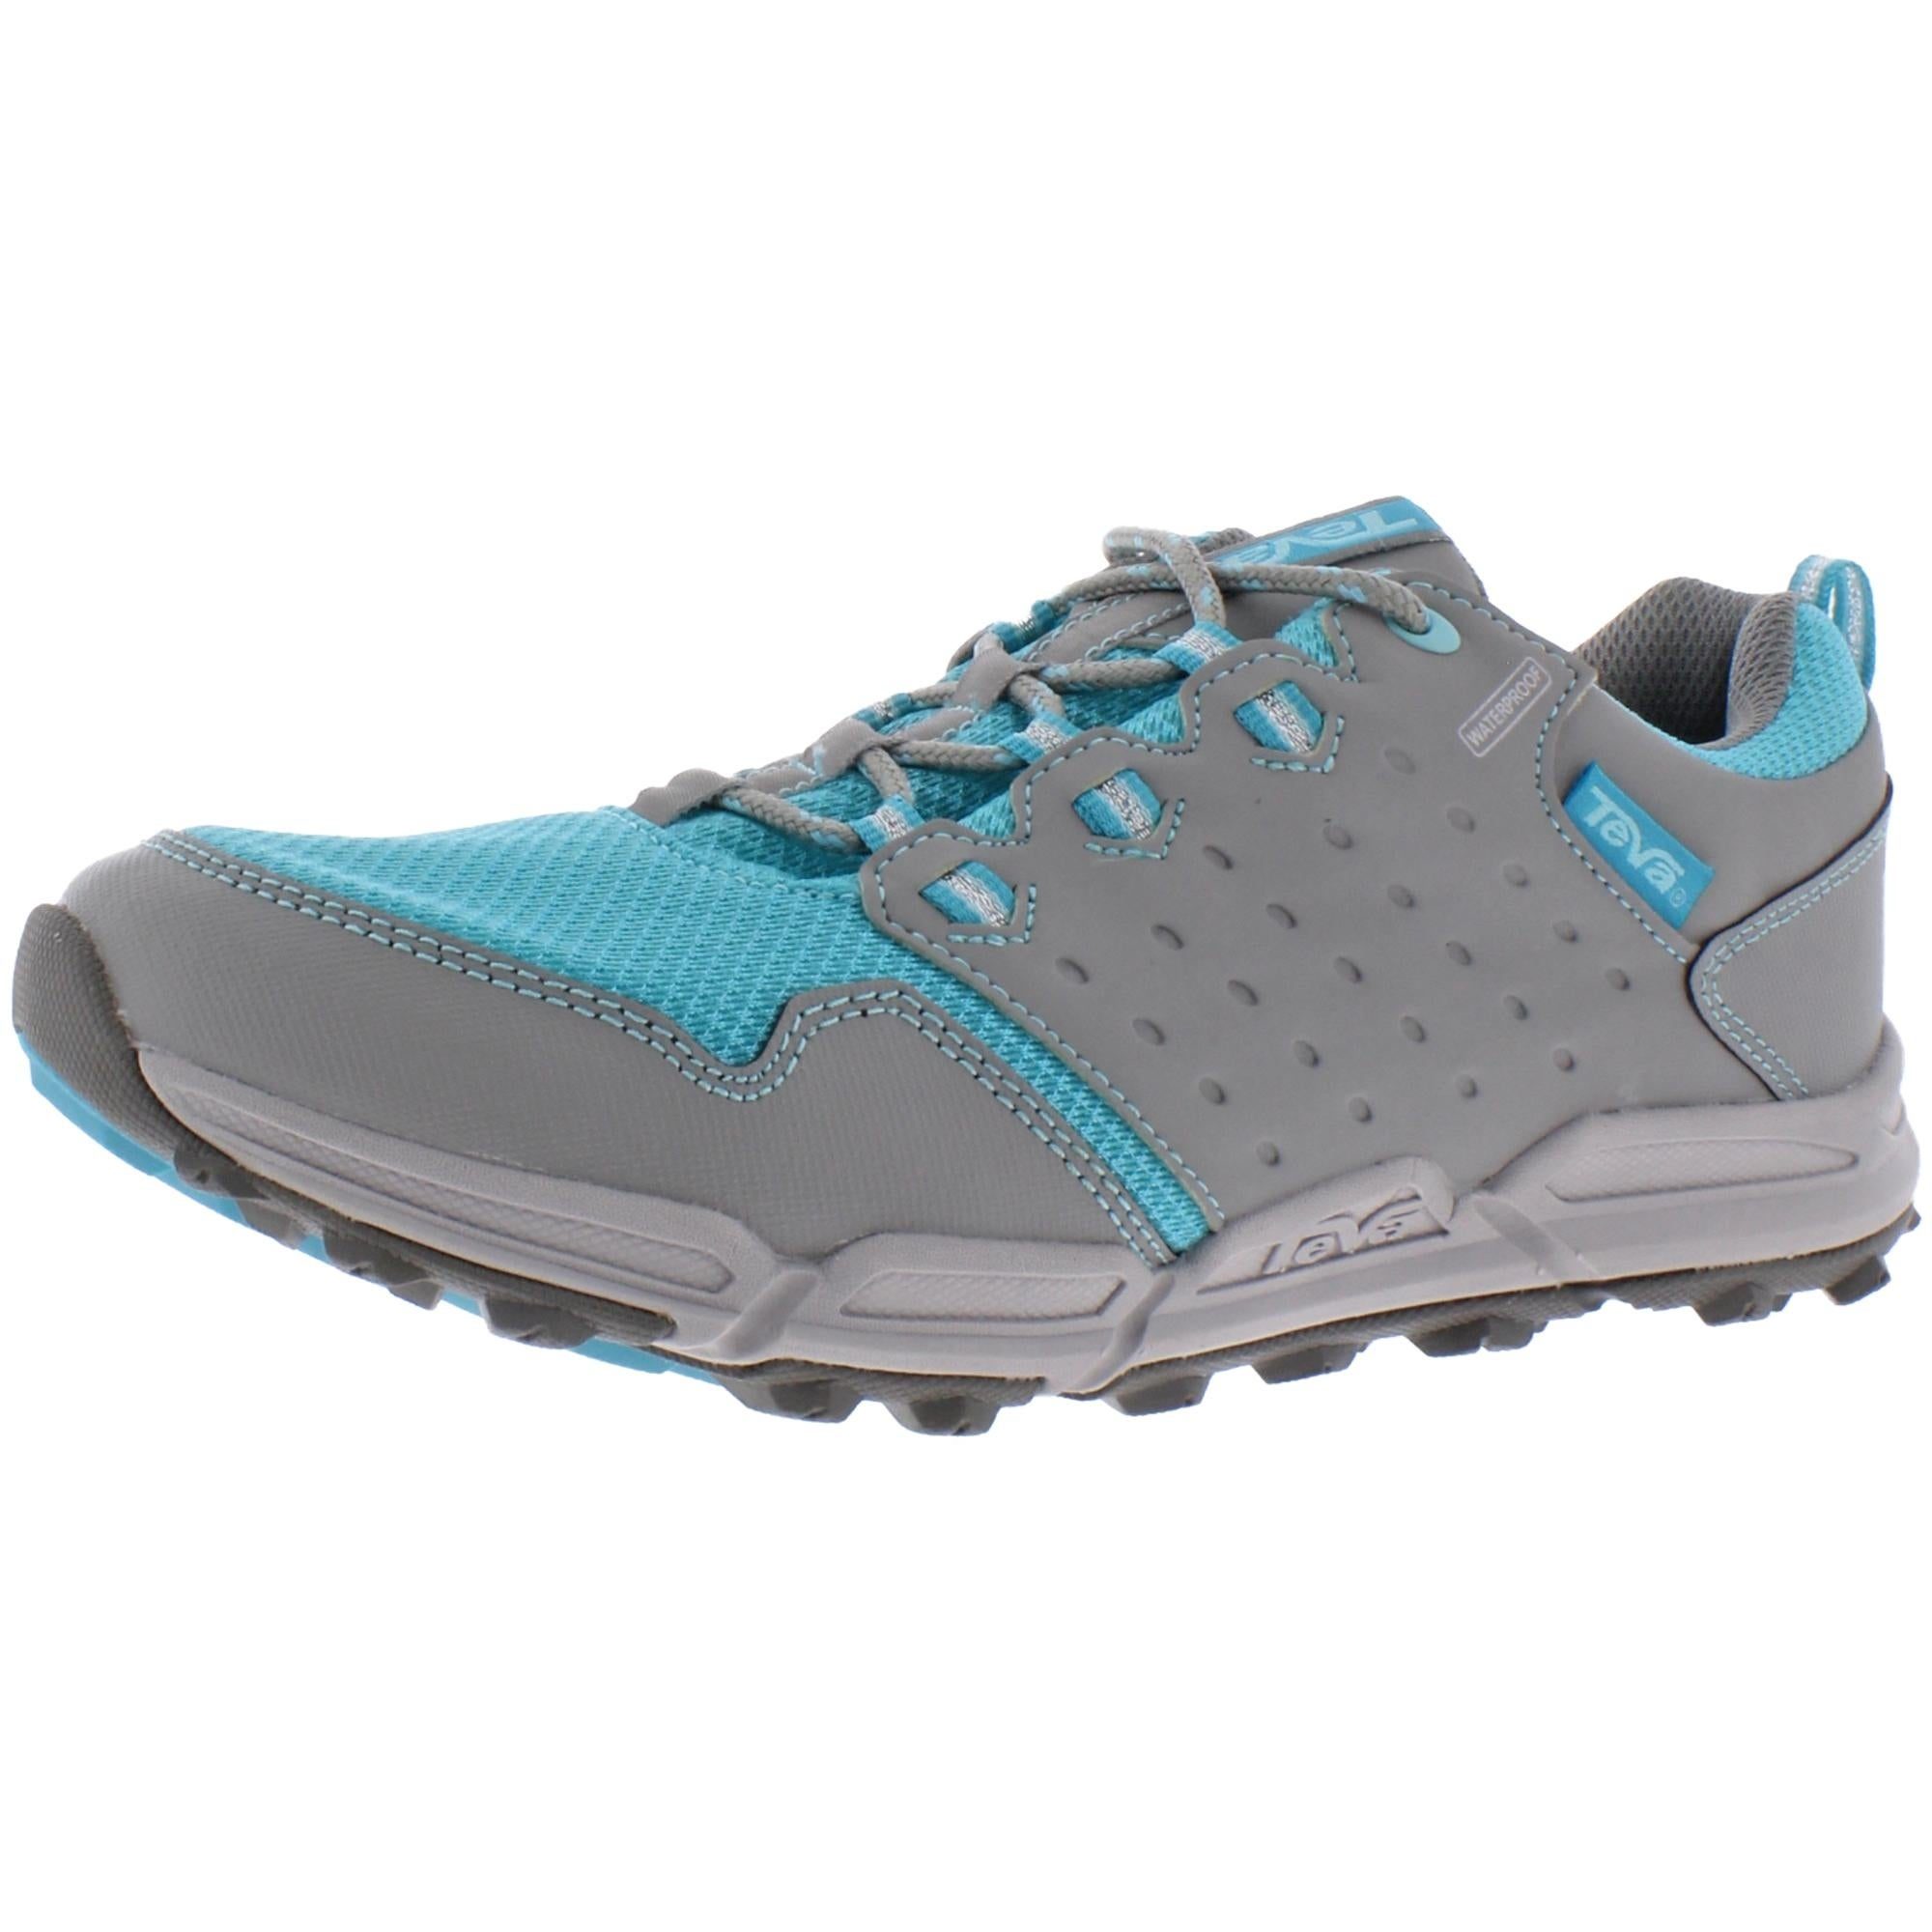 Shop Teva Girls J Wit Athletic Shoes